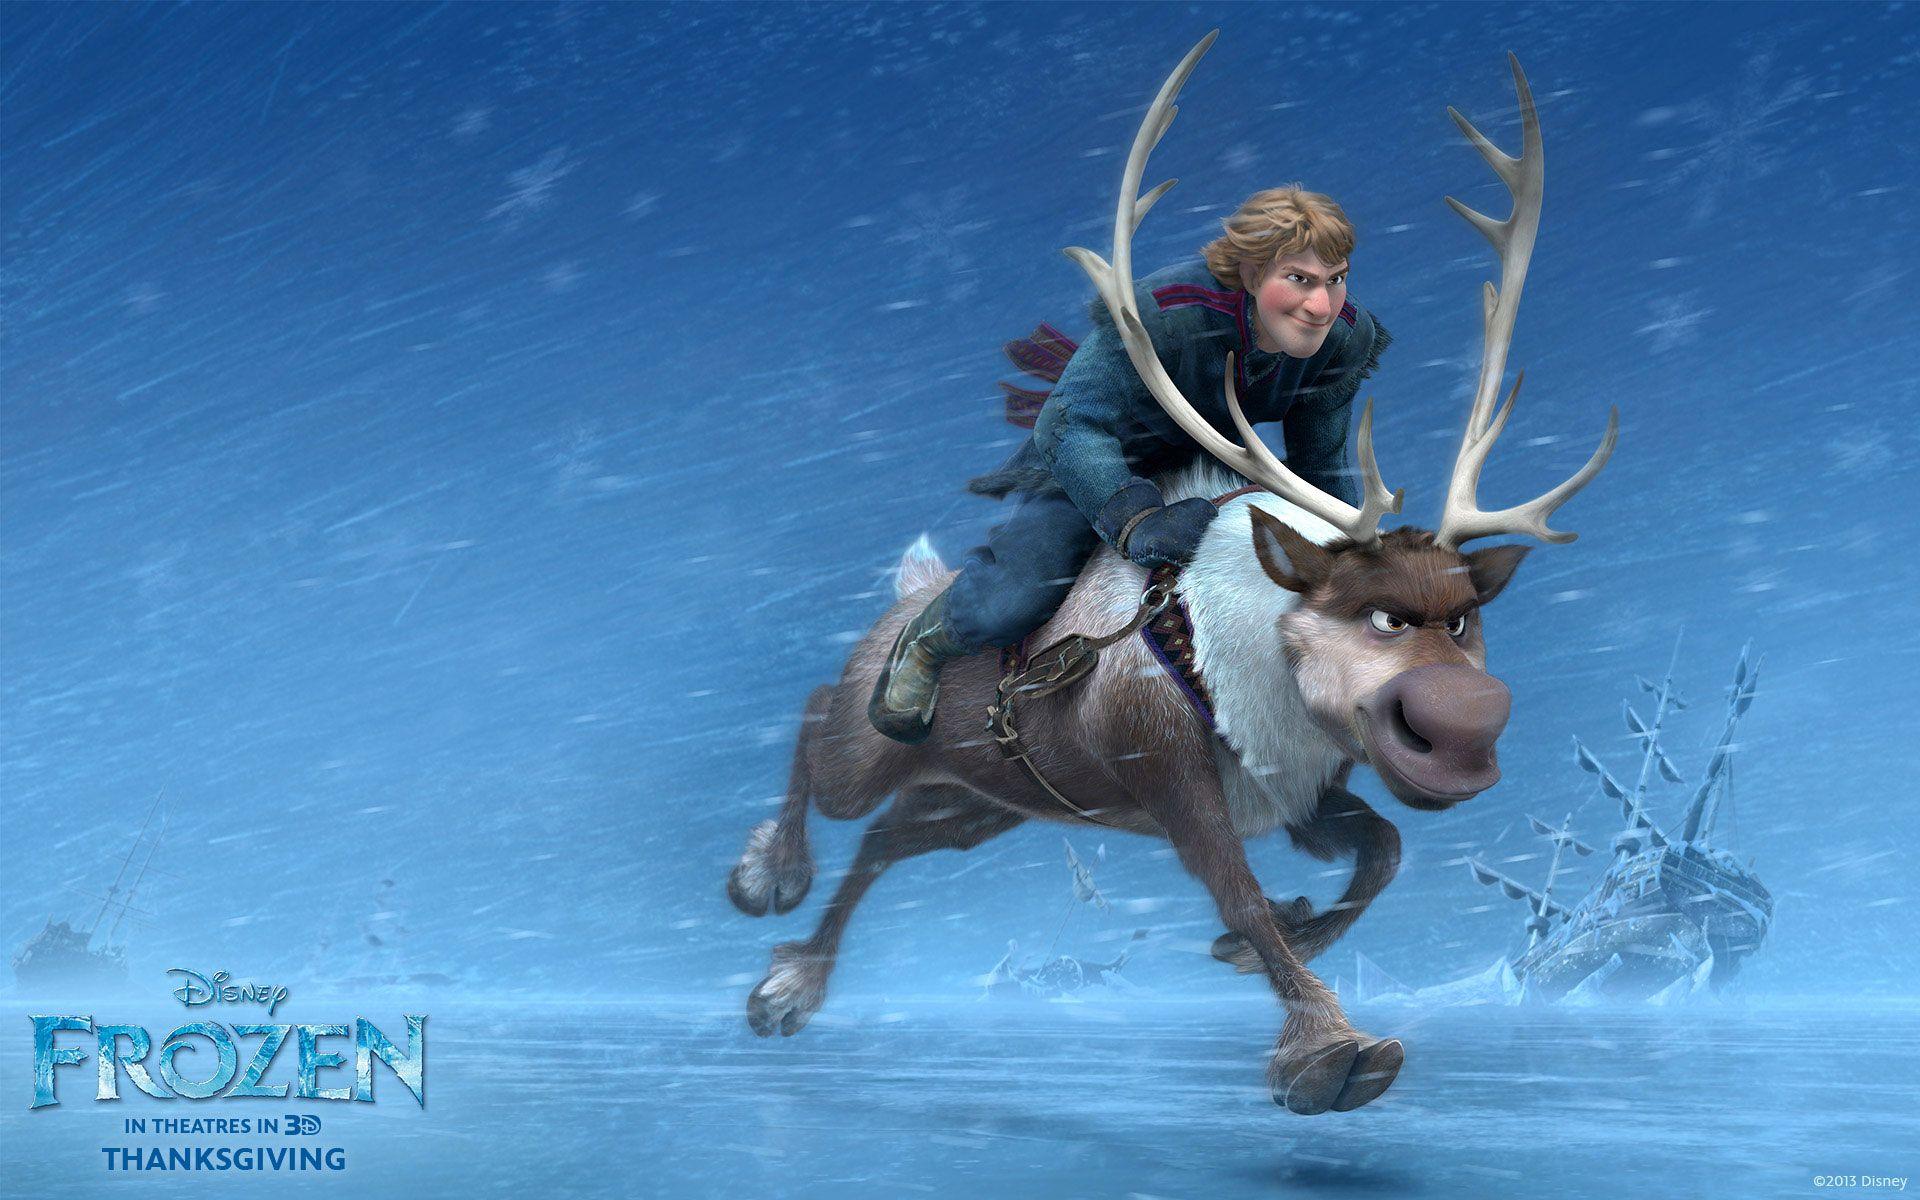 frozen movie pictures | Frozen Movie kristoff Sven HD Wallpaper Frozen 2013 Movie Wallpapers ...